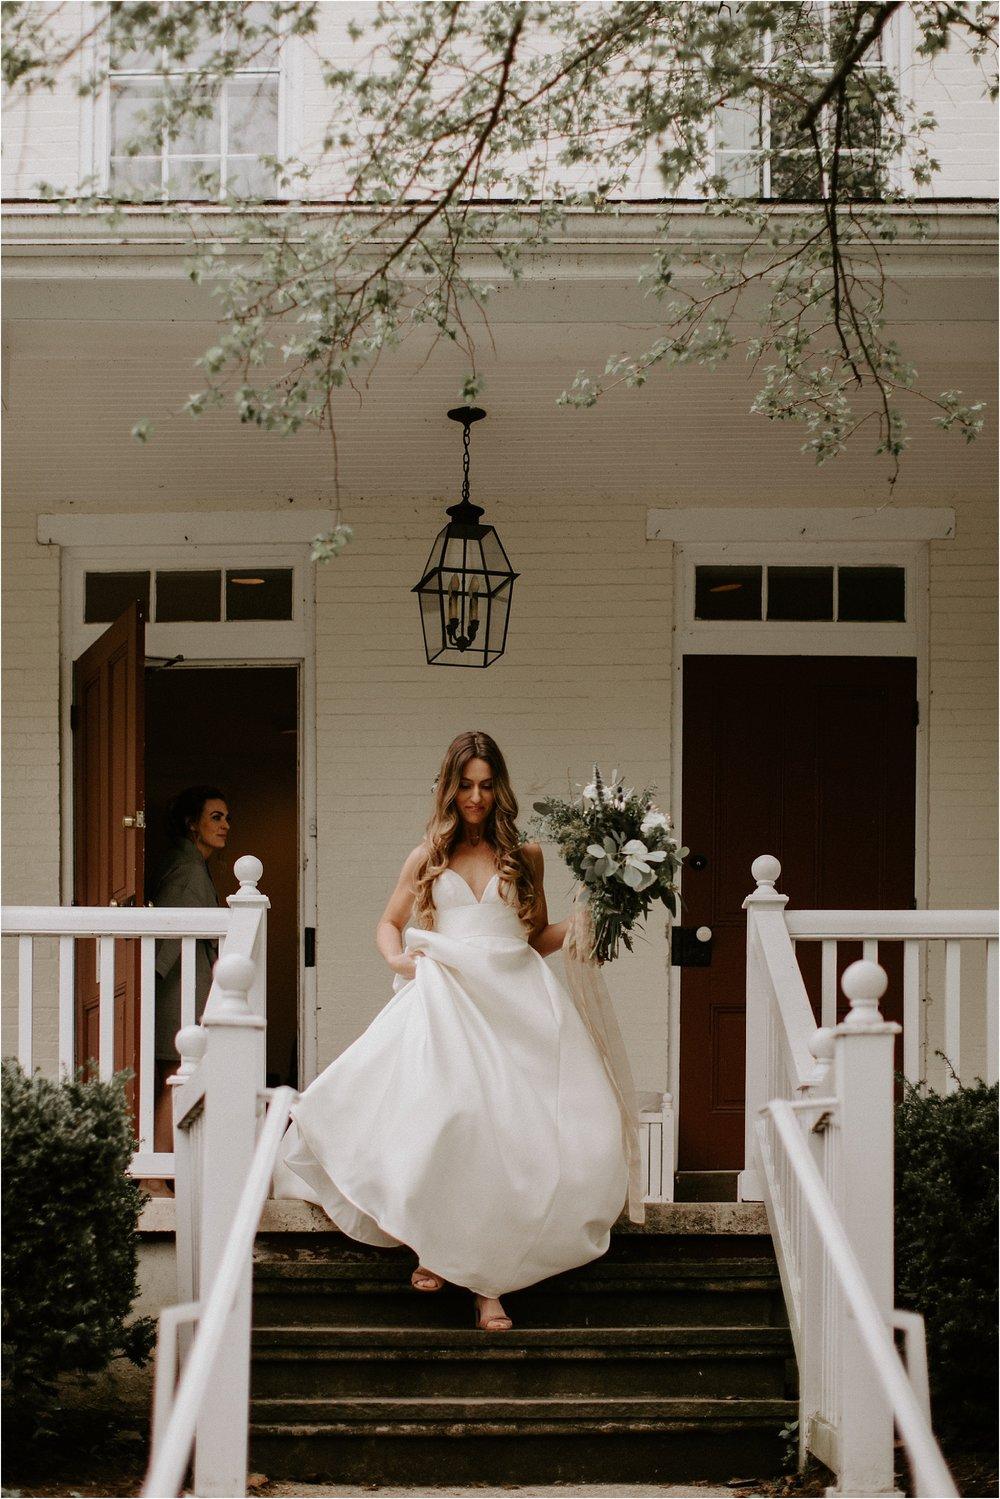 Sarah_Brookhart_Lancaster_PA_Wedding_Photographer_0020.jpg